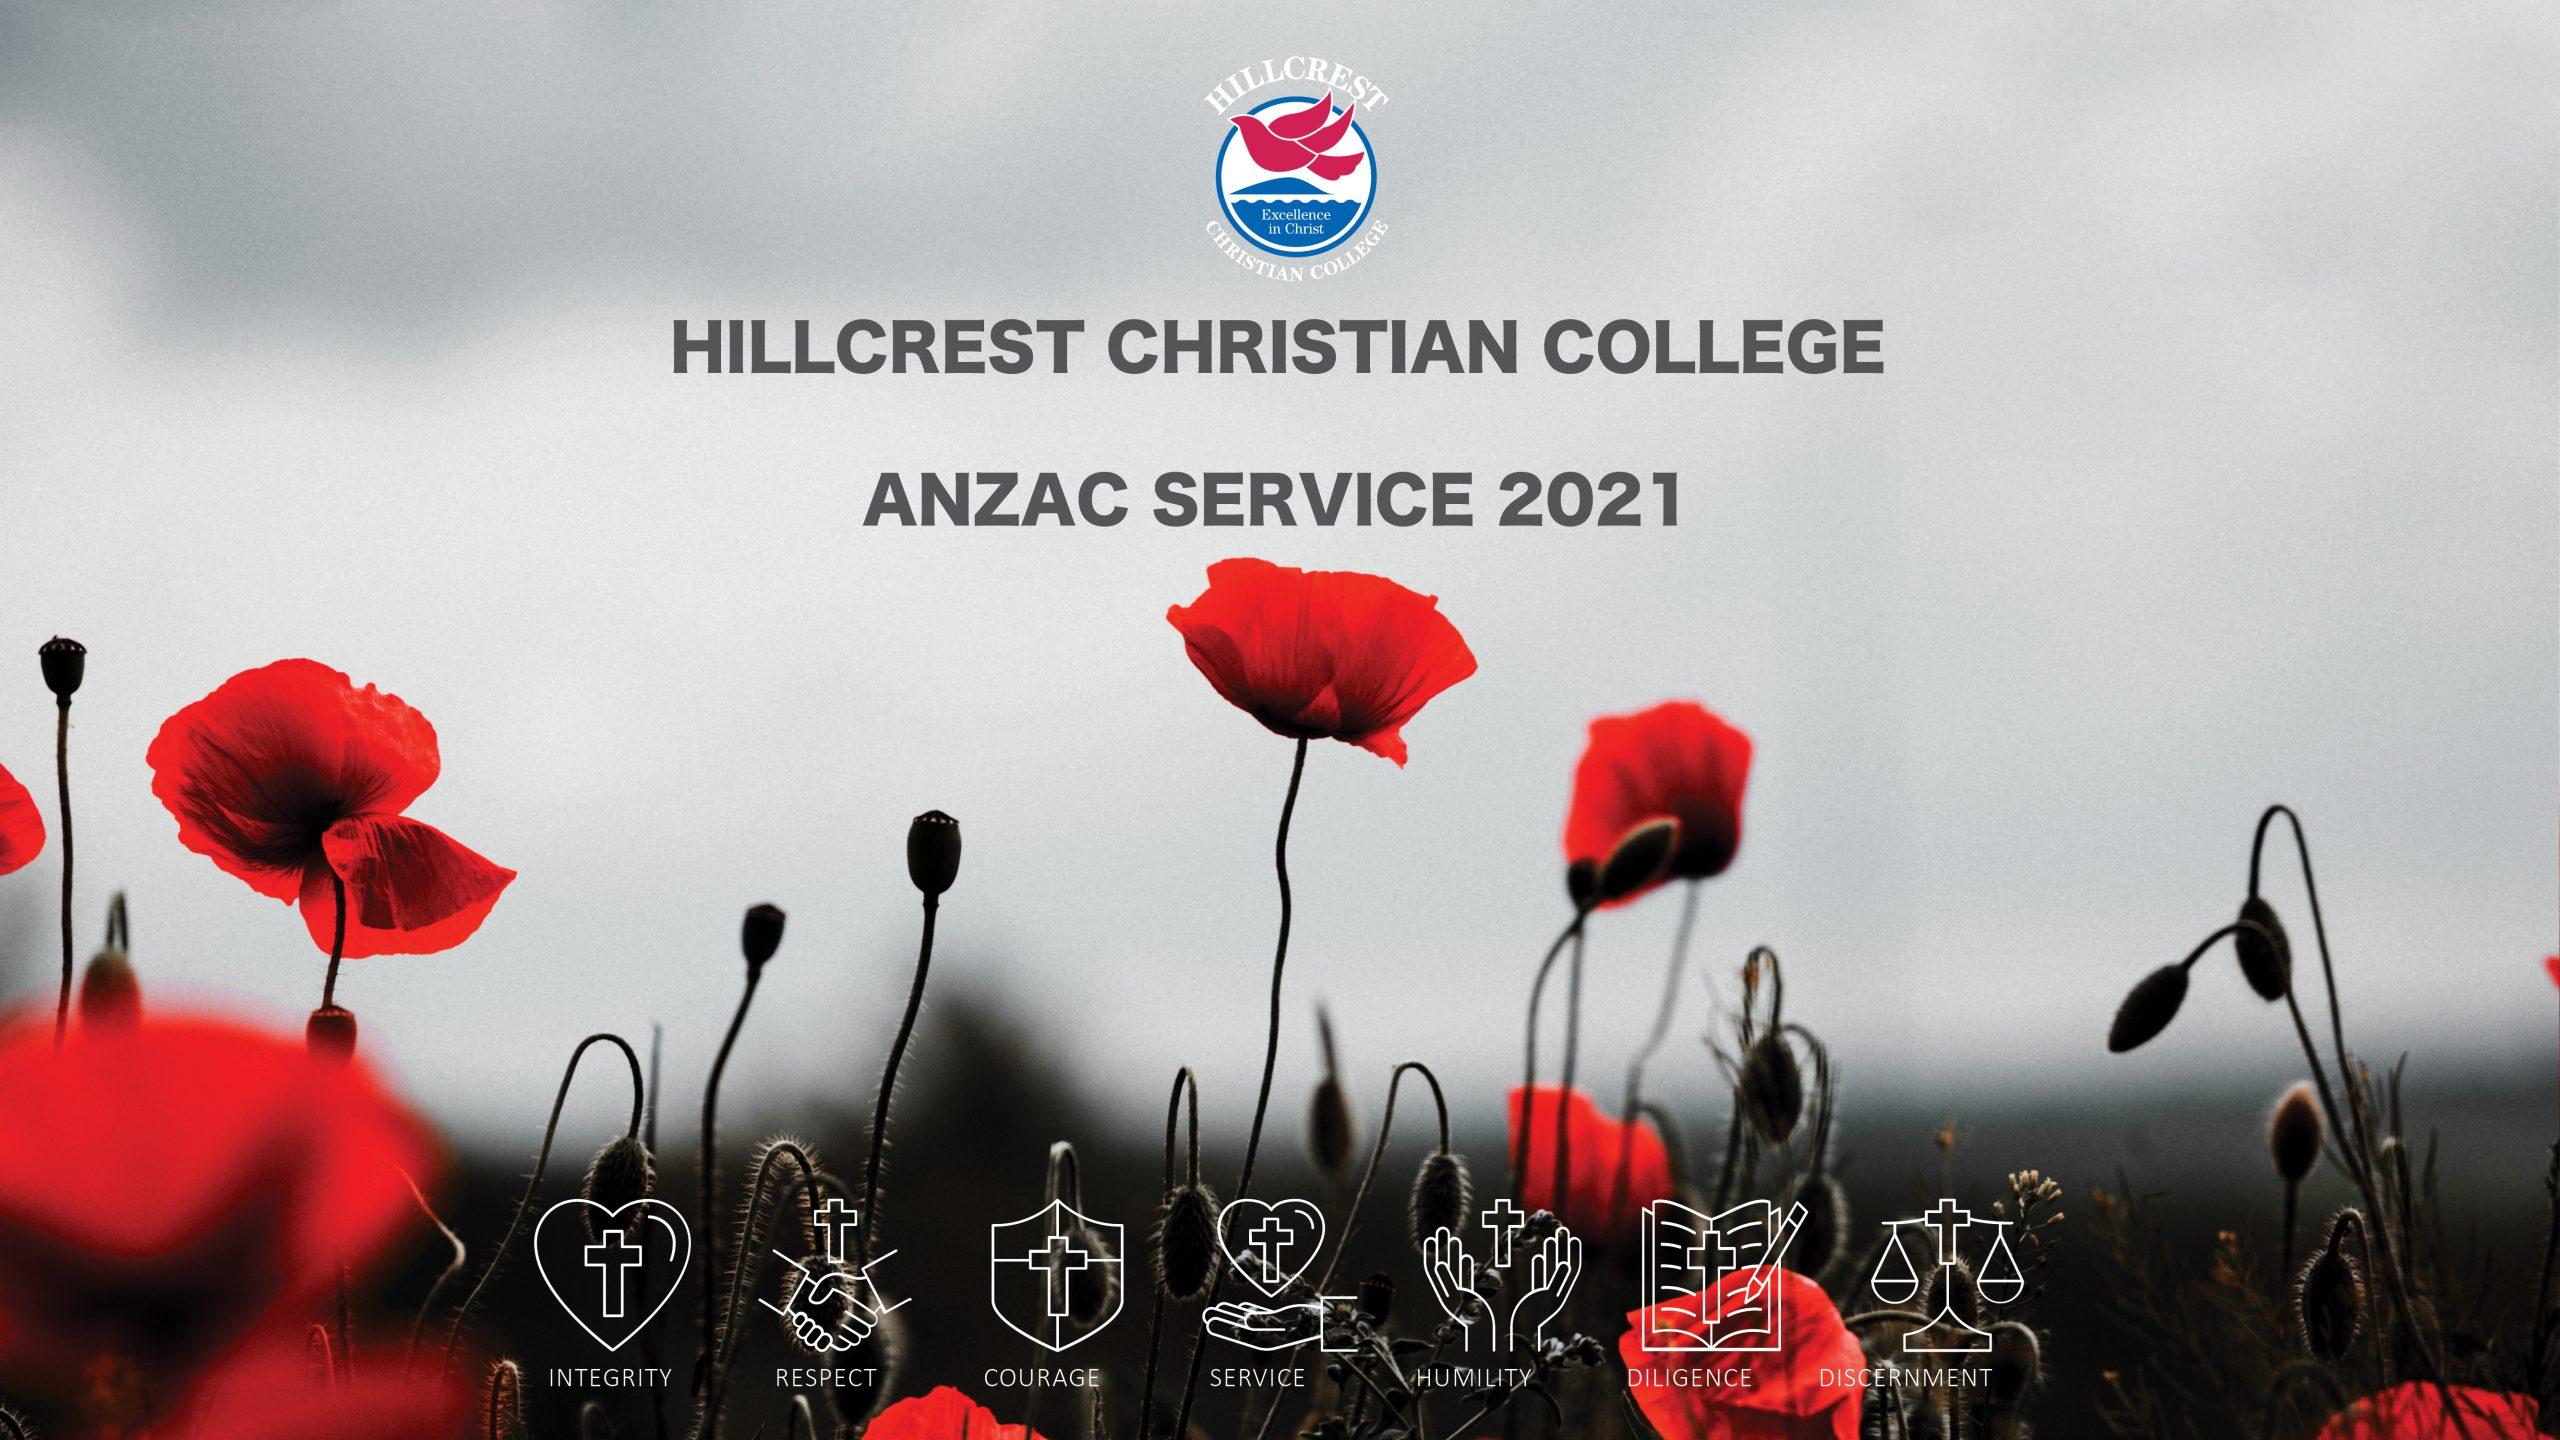 ANZAC SERVICE 2021